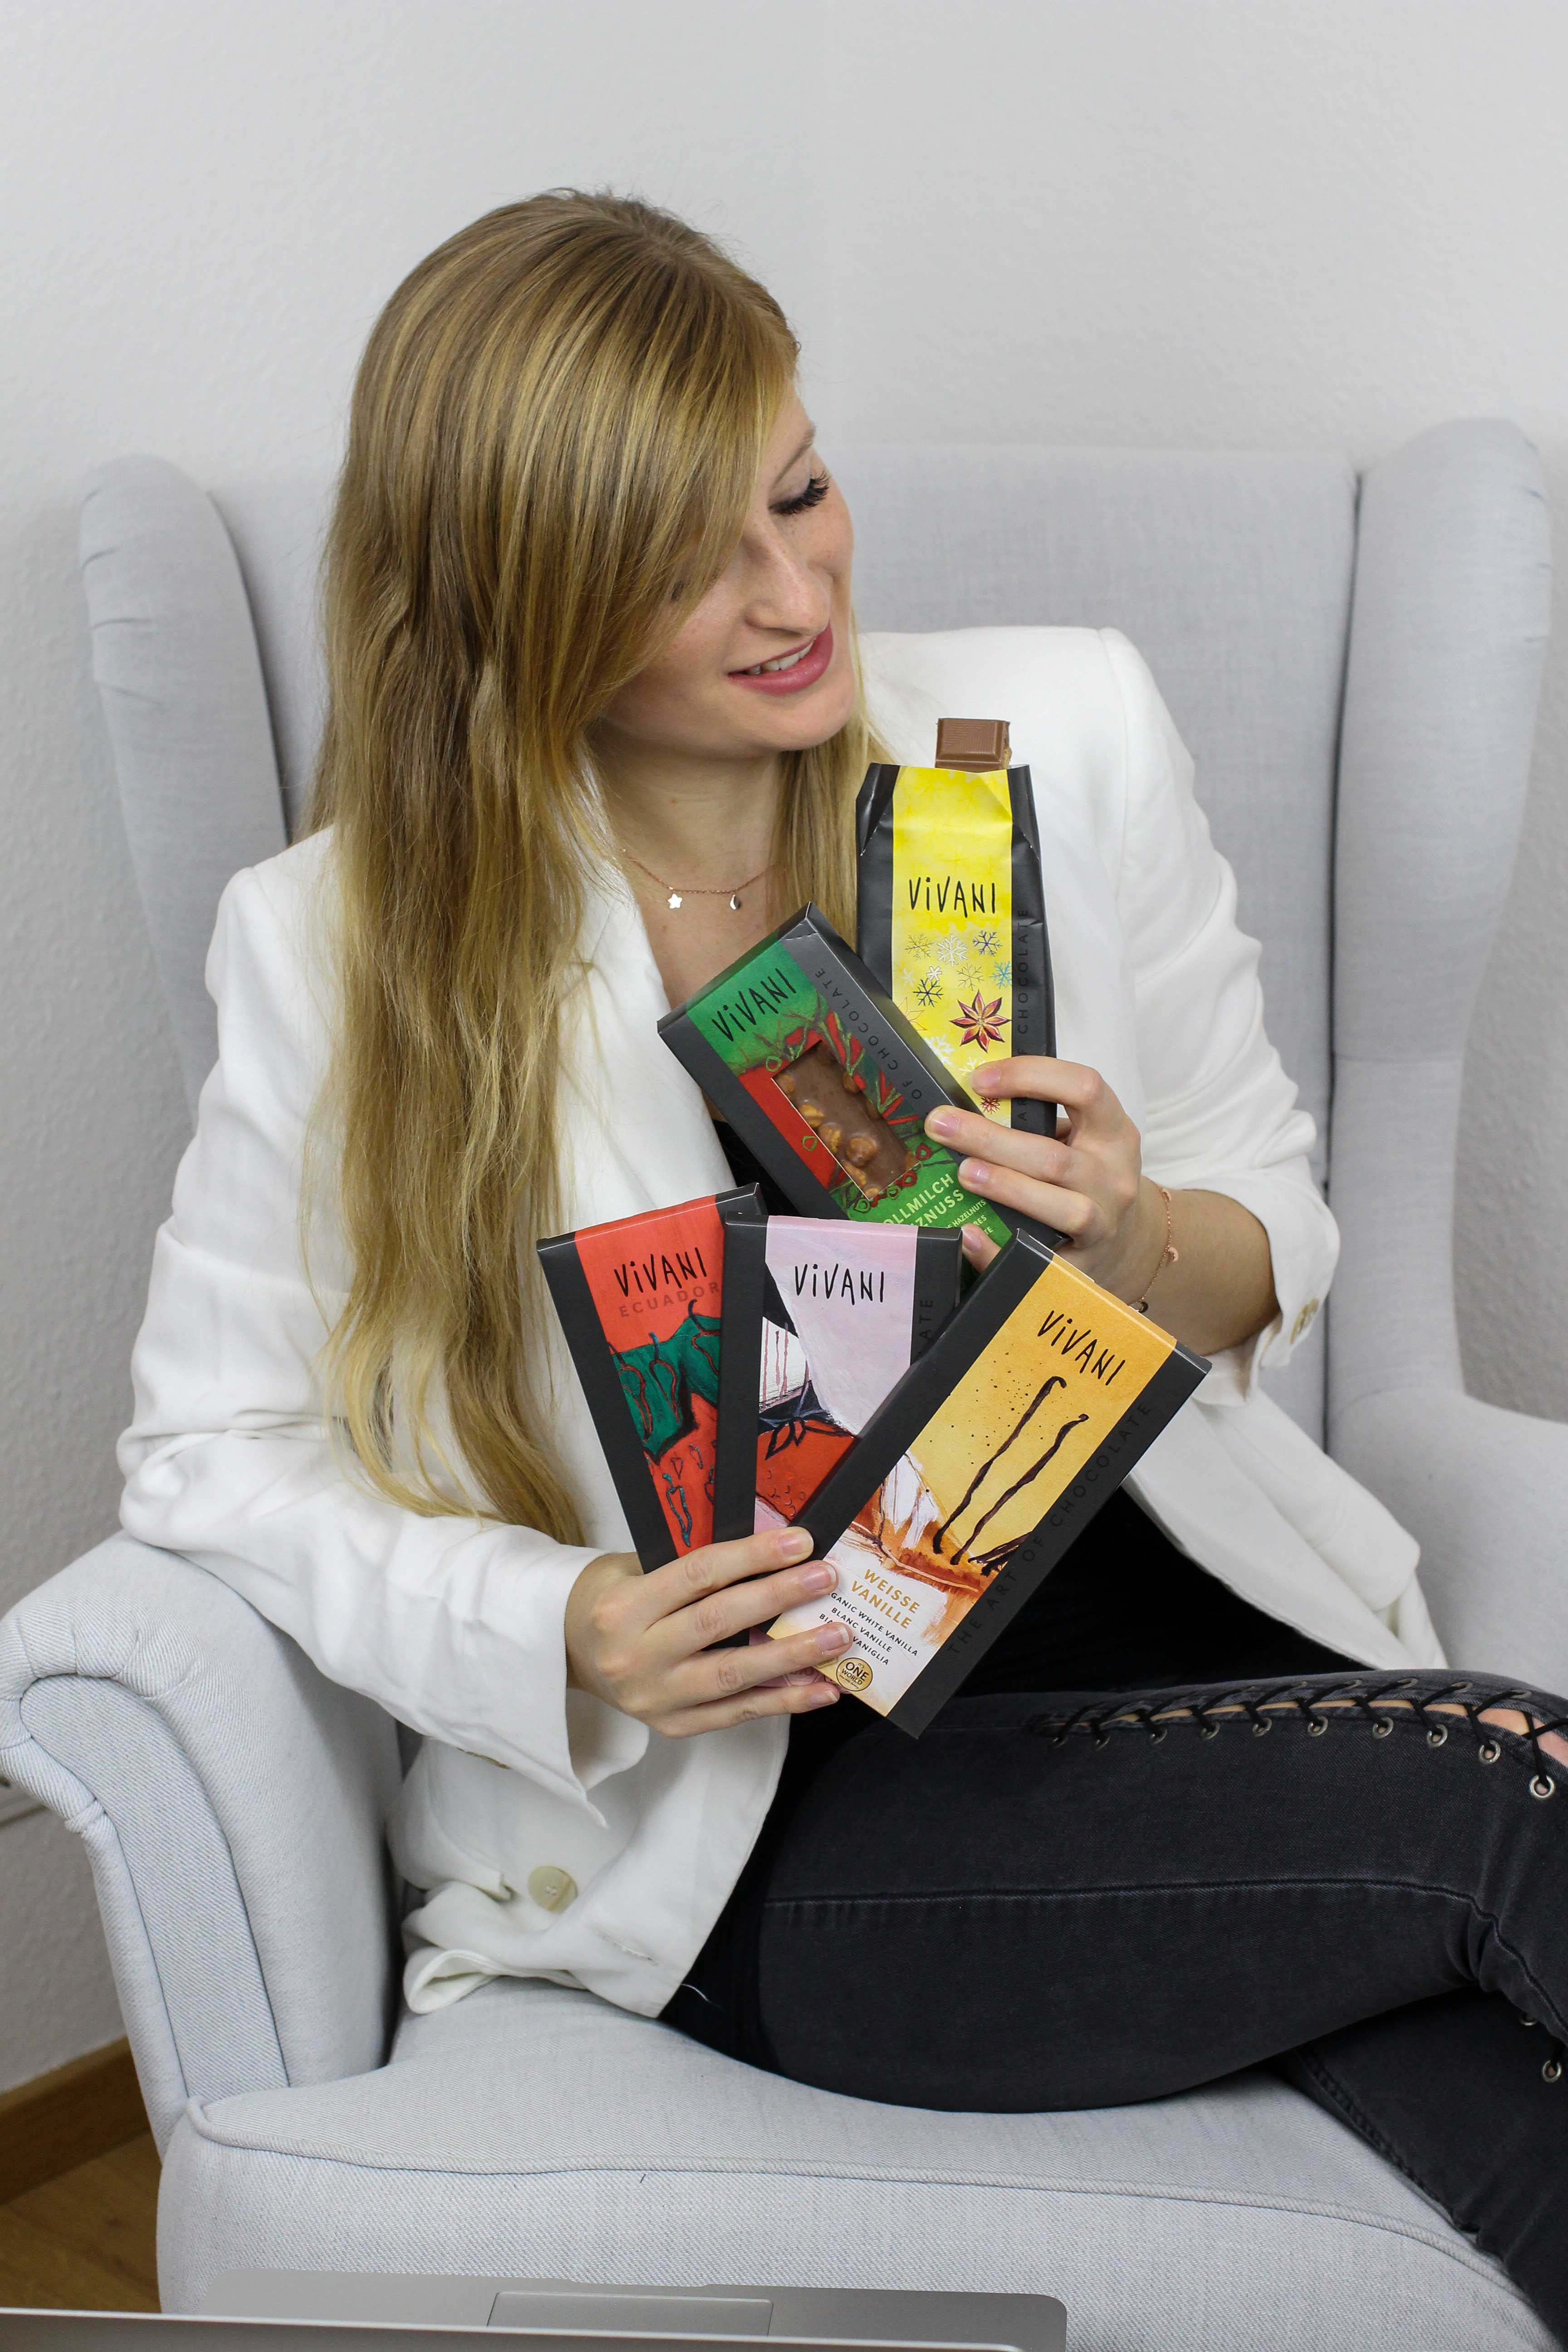 Blogger Adventskalender 24 Days of Christmas Blogging Vivani Schokoladen Sets Winterschokolade Nussschokolade Blogger Arbeitsplatz 5